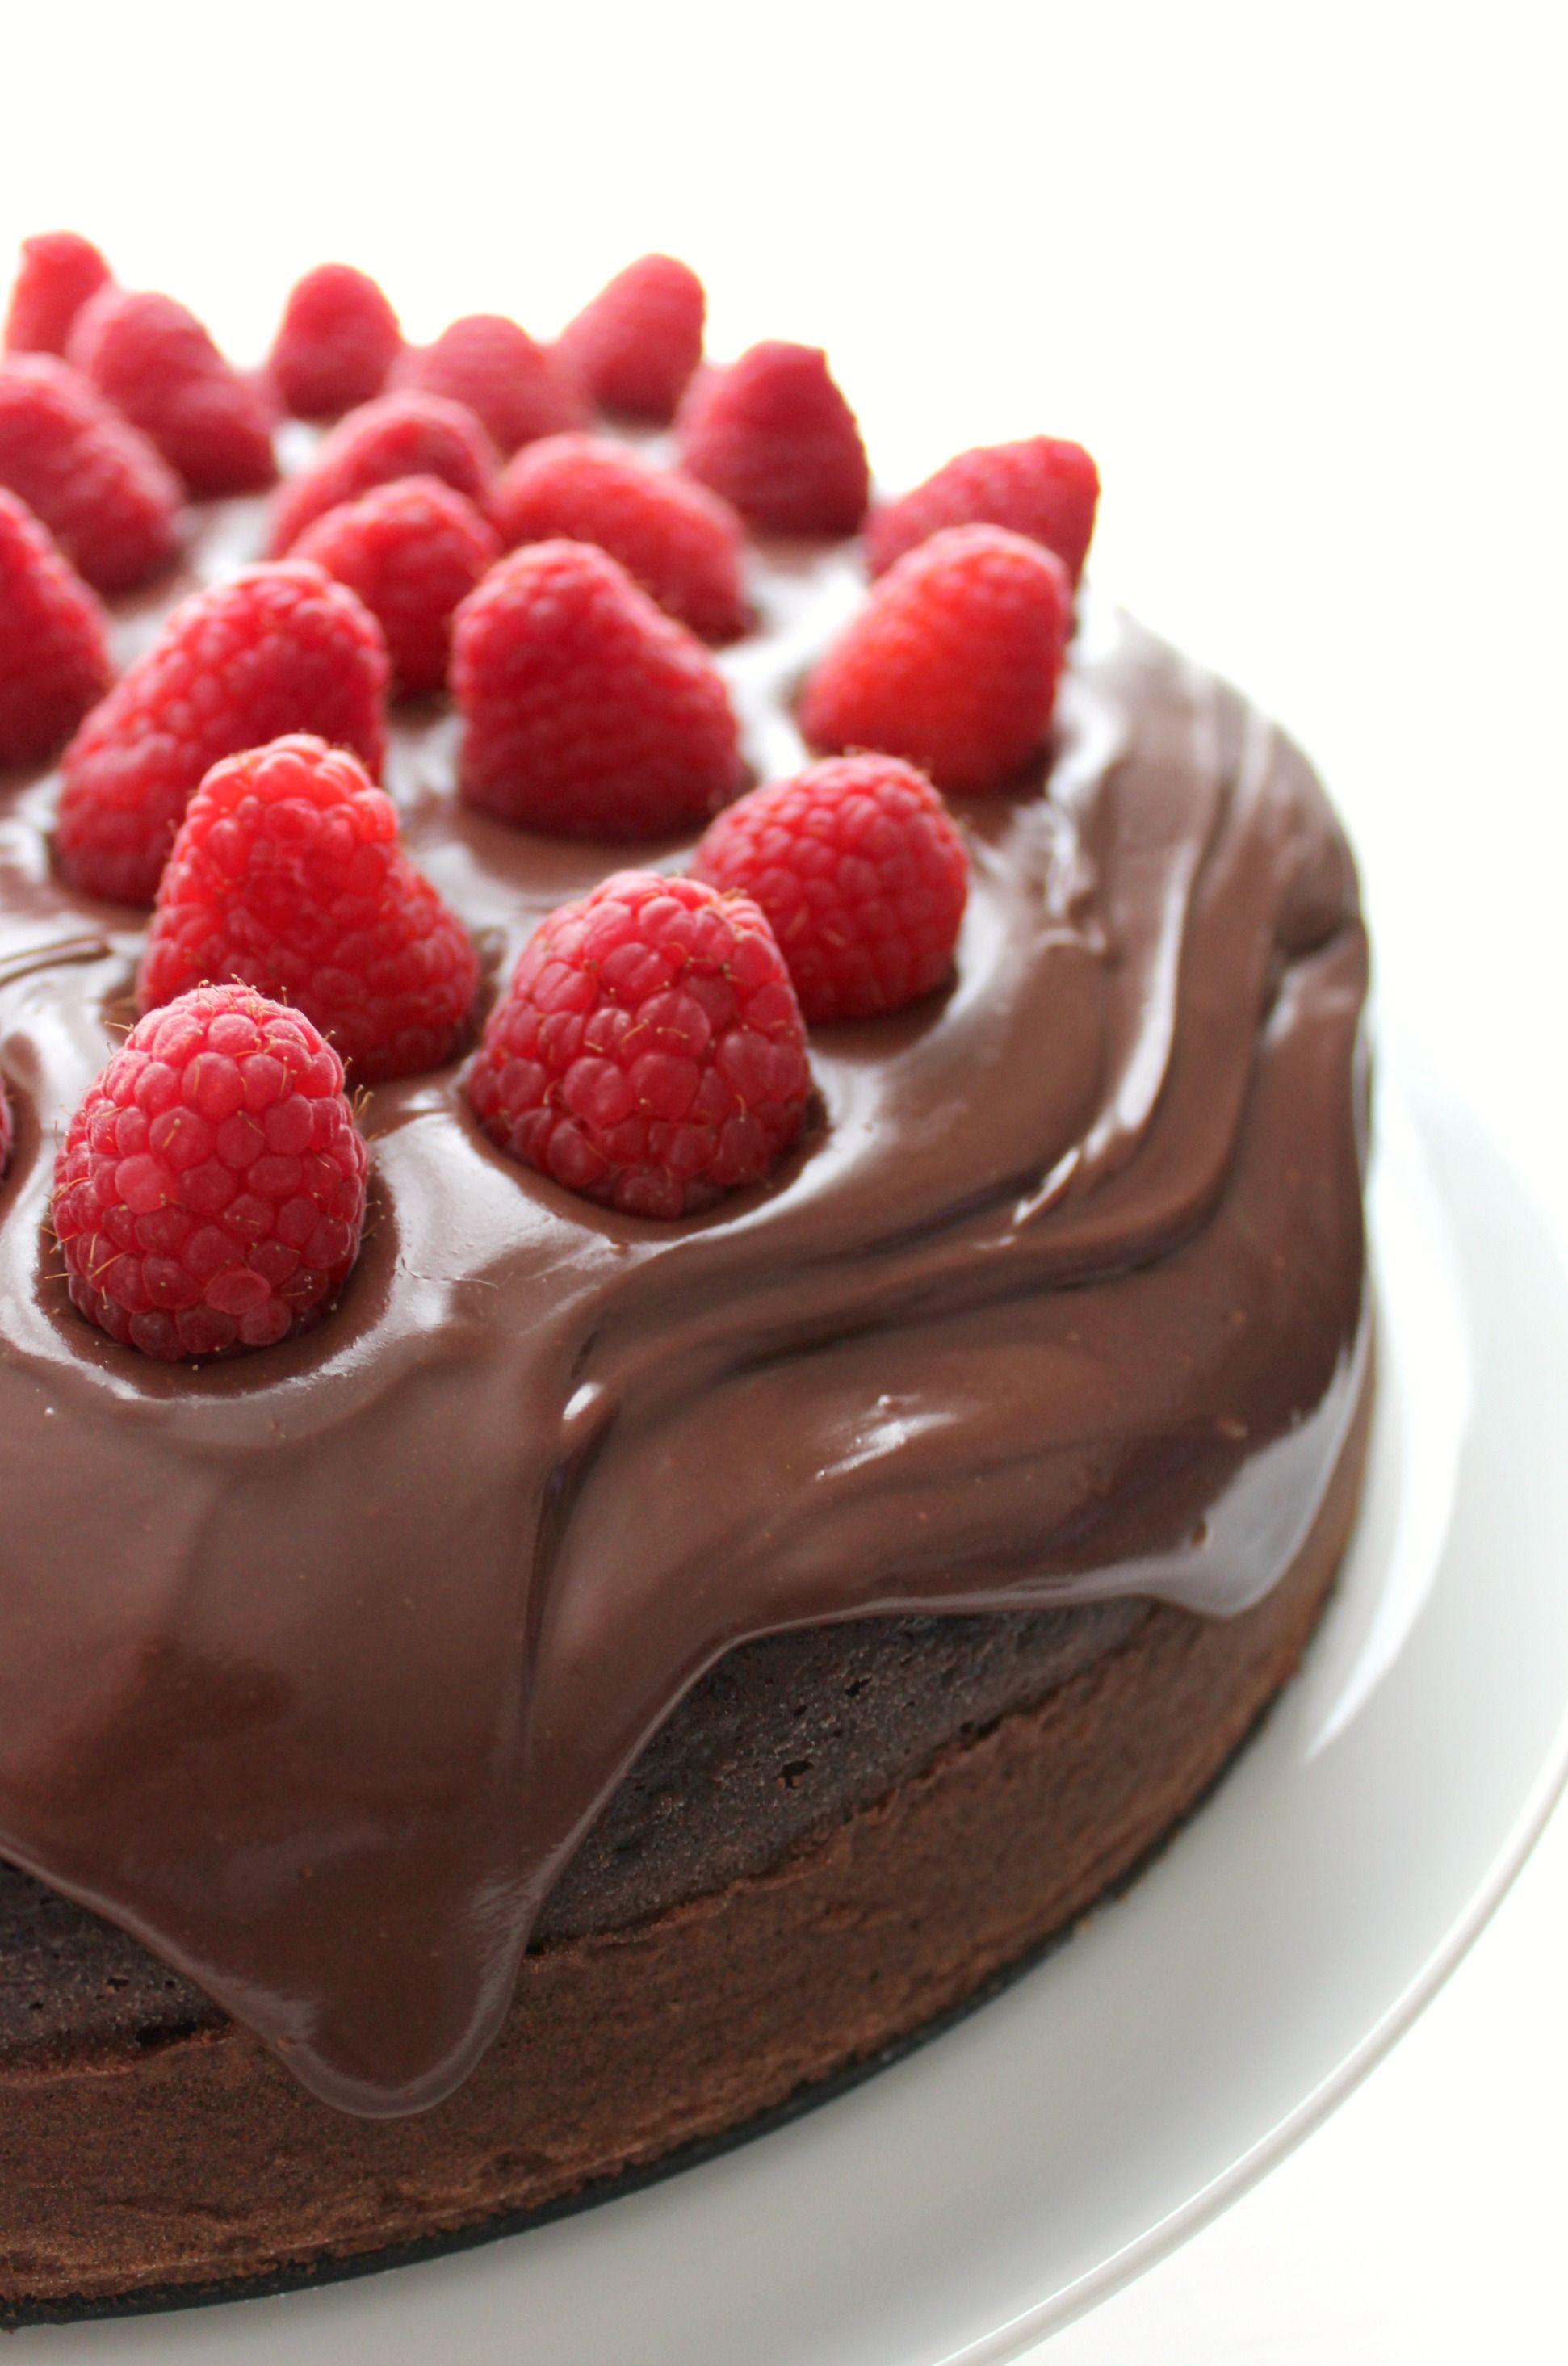 Bester schokoladenkuchen berlin